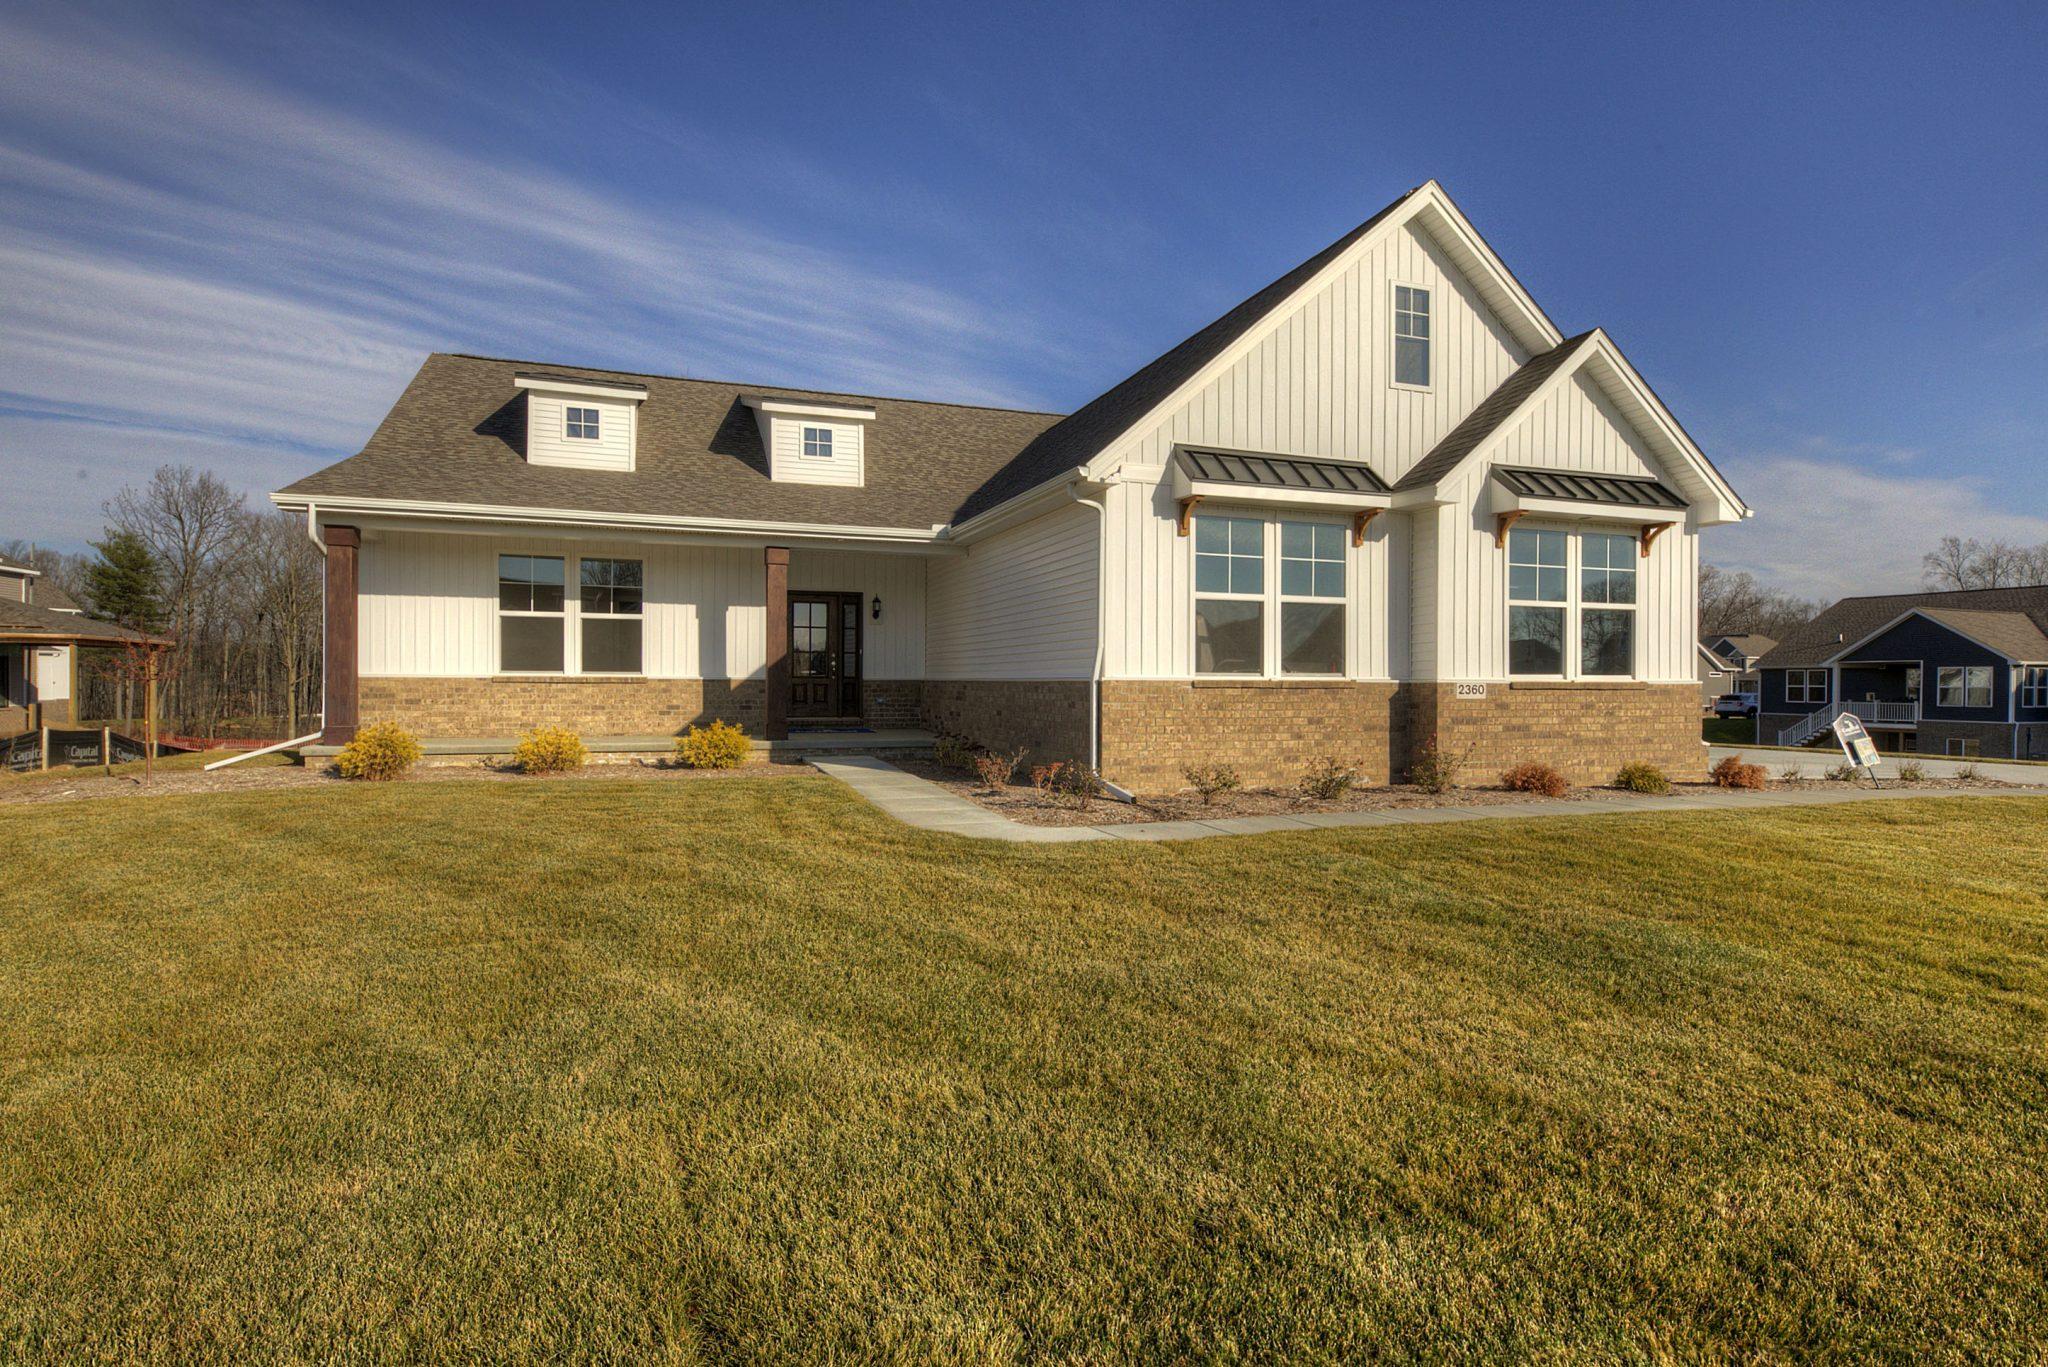 491 Trestle Drive, Highlands Homesite 12